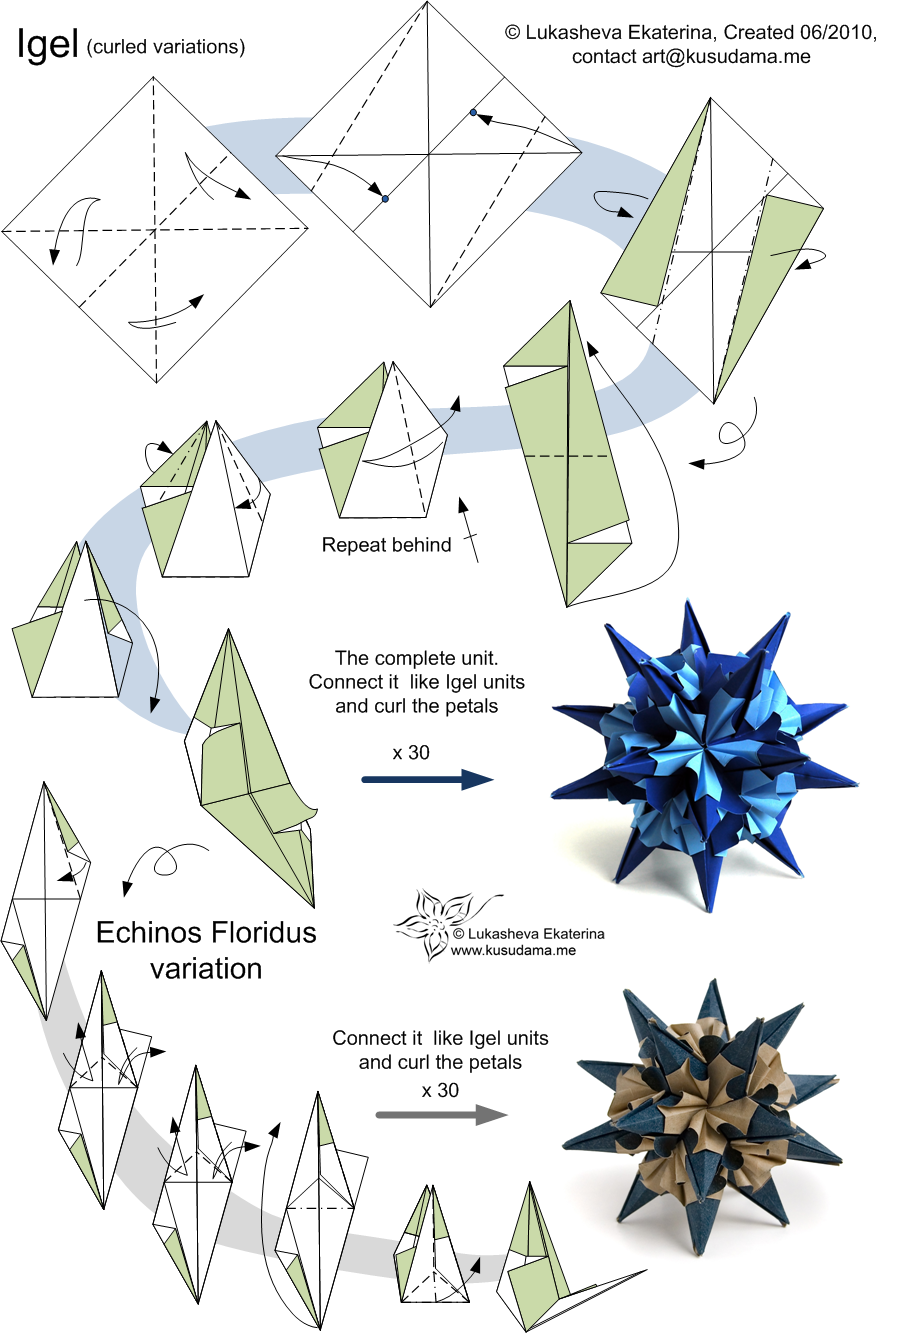 kusudama me modular origami origami pinterest origami rh pinterest com modular origami polyhedra diagrams origami modular diagrama